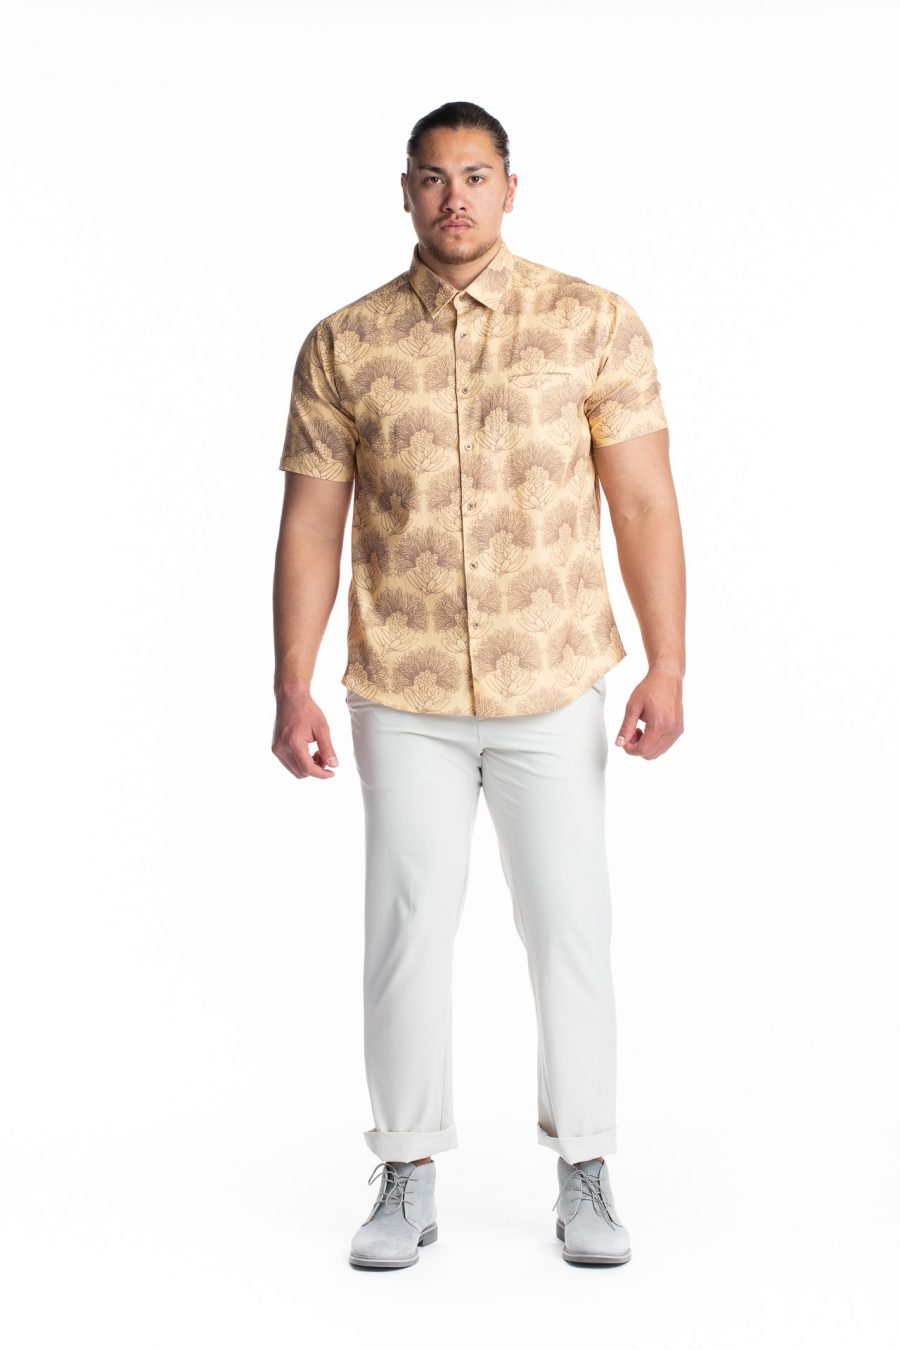 Male model wearing Aloha Short Sleeve in Apricot Sherbert/Gingersnap Kalihilehua pattern - front view